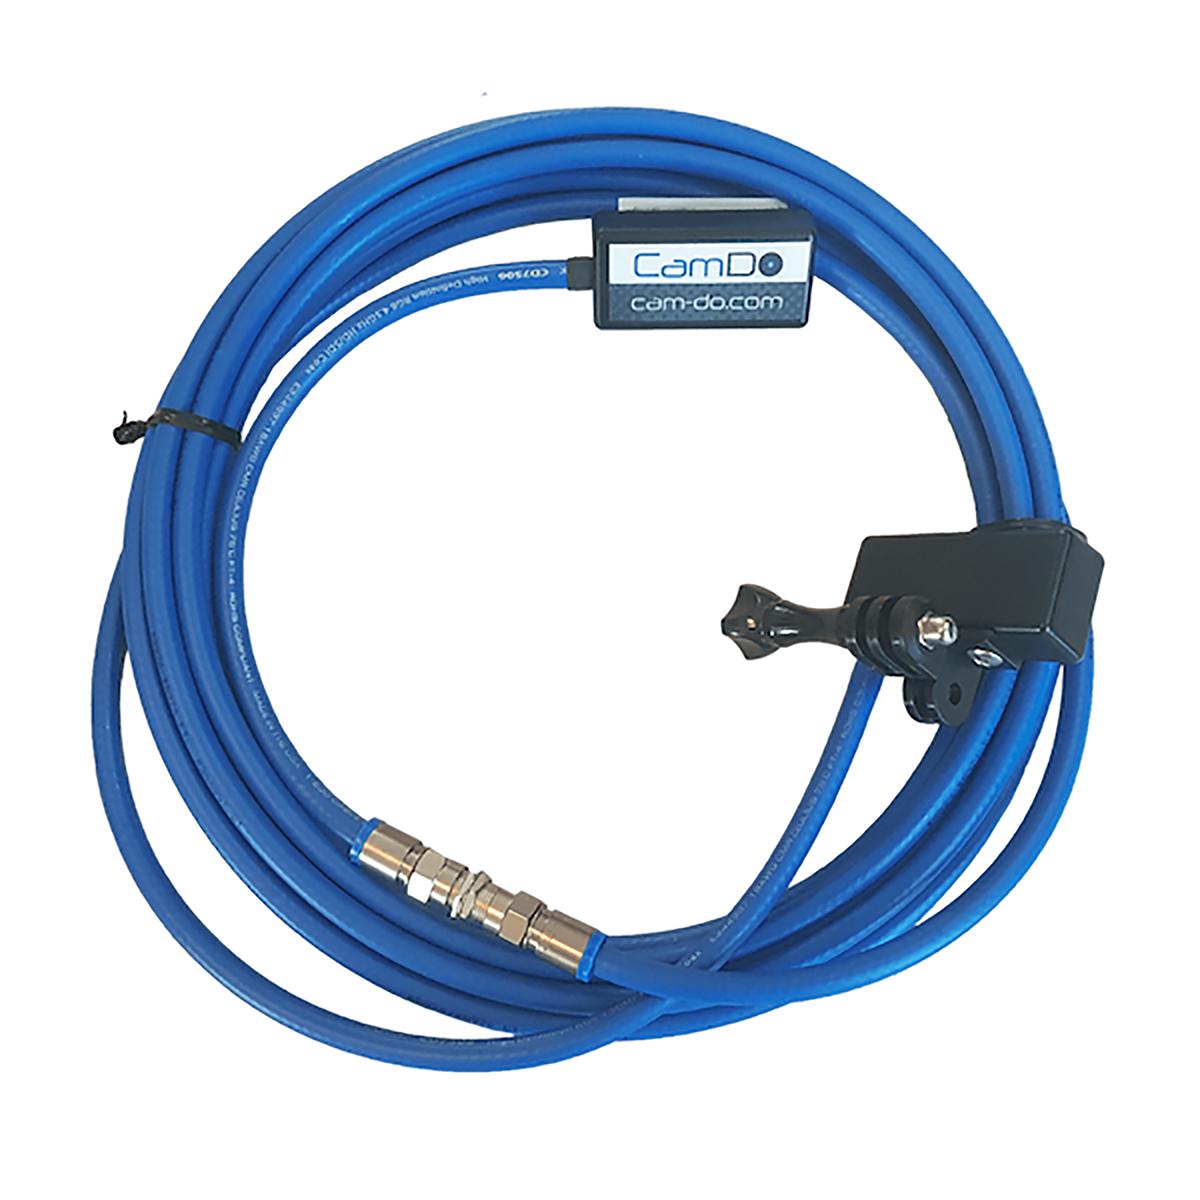 CamDo underwater WiFi Cable